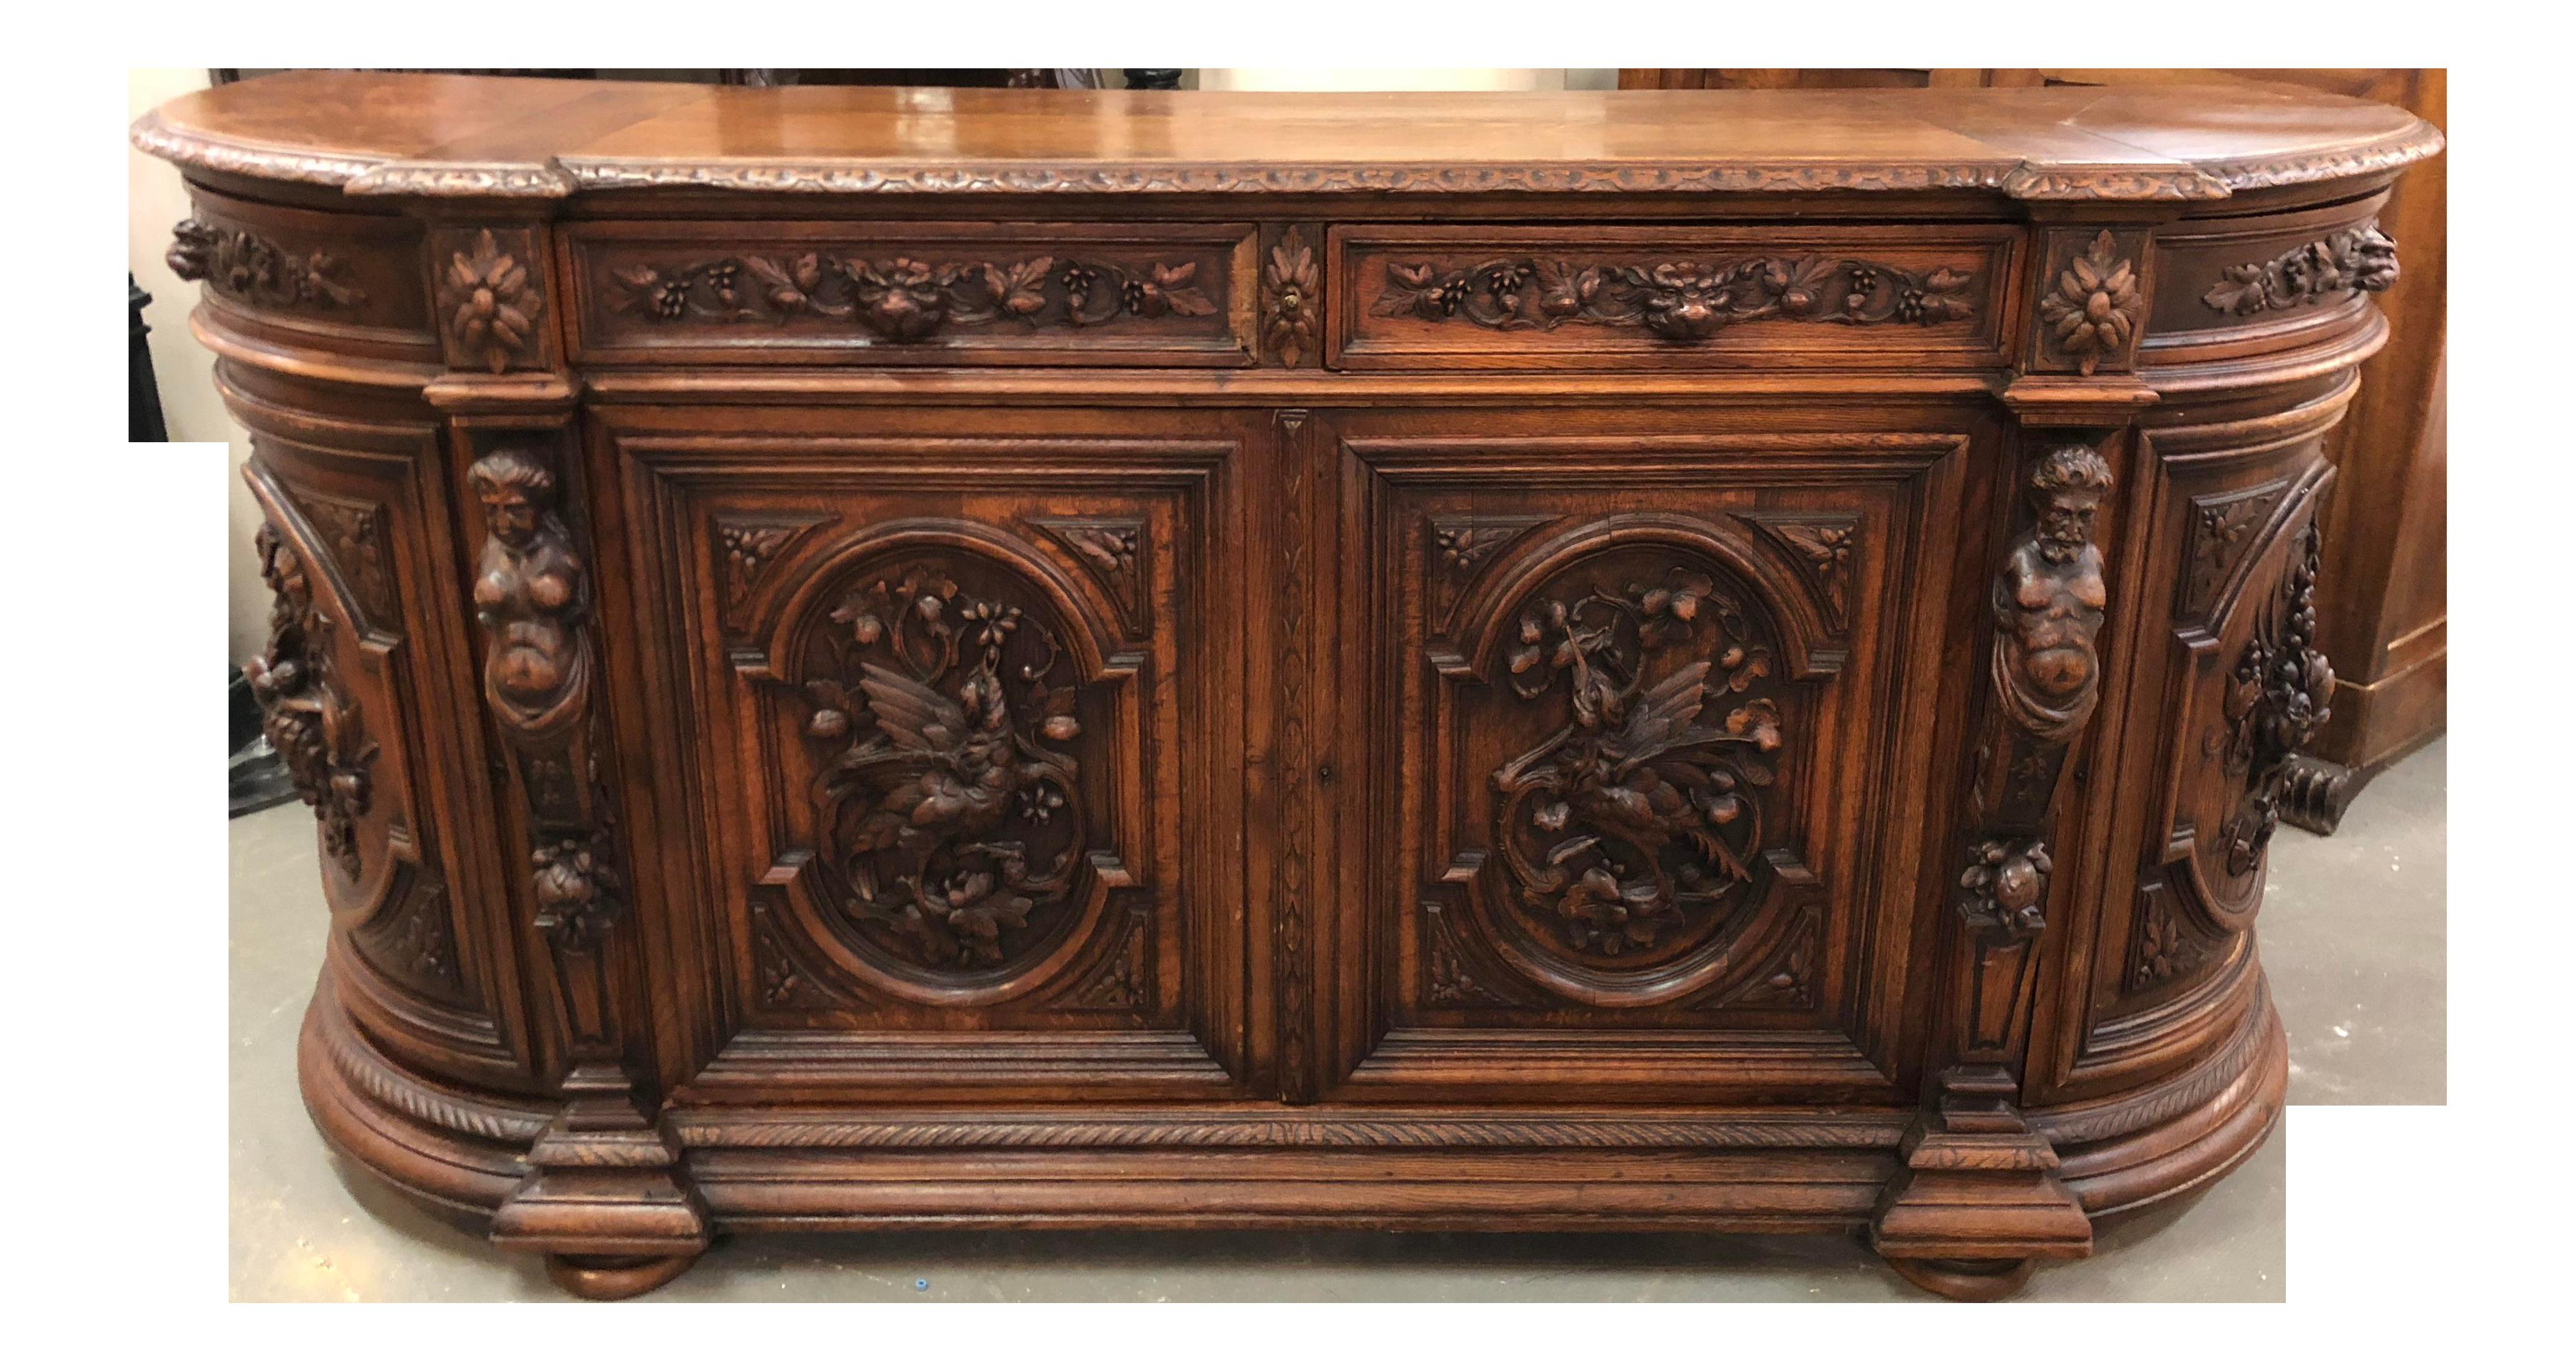 French Renaissance Louis Xiii Huntboard Sideboard Buffet Sideboard Cabinet Furniture